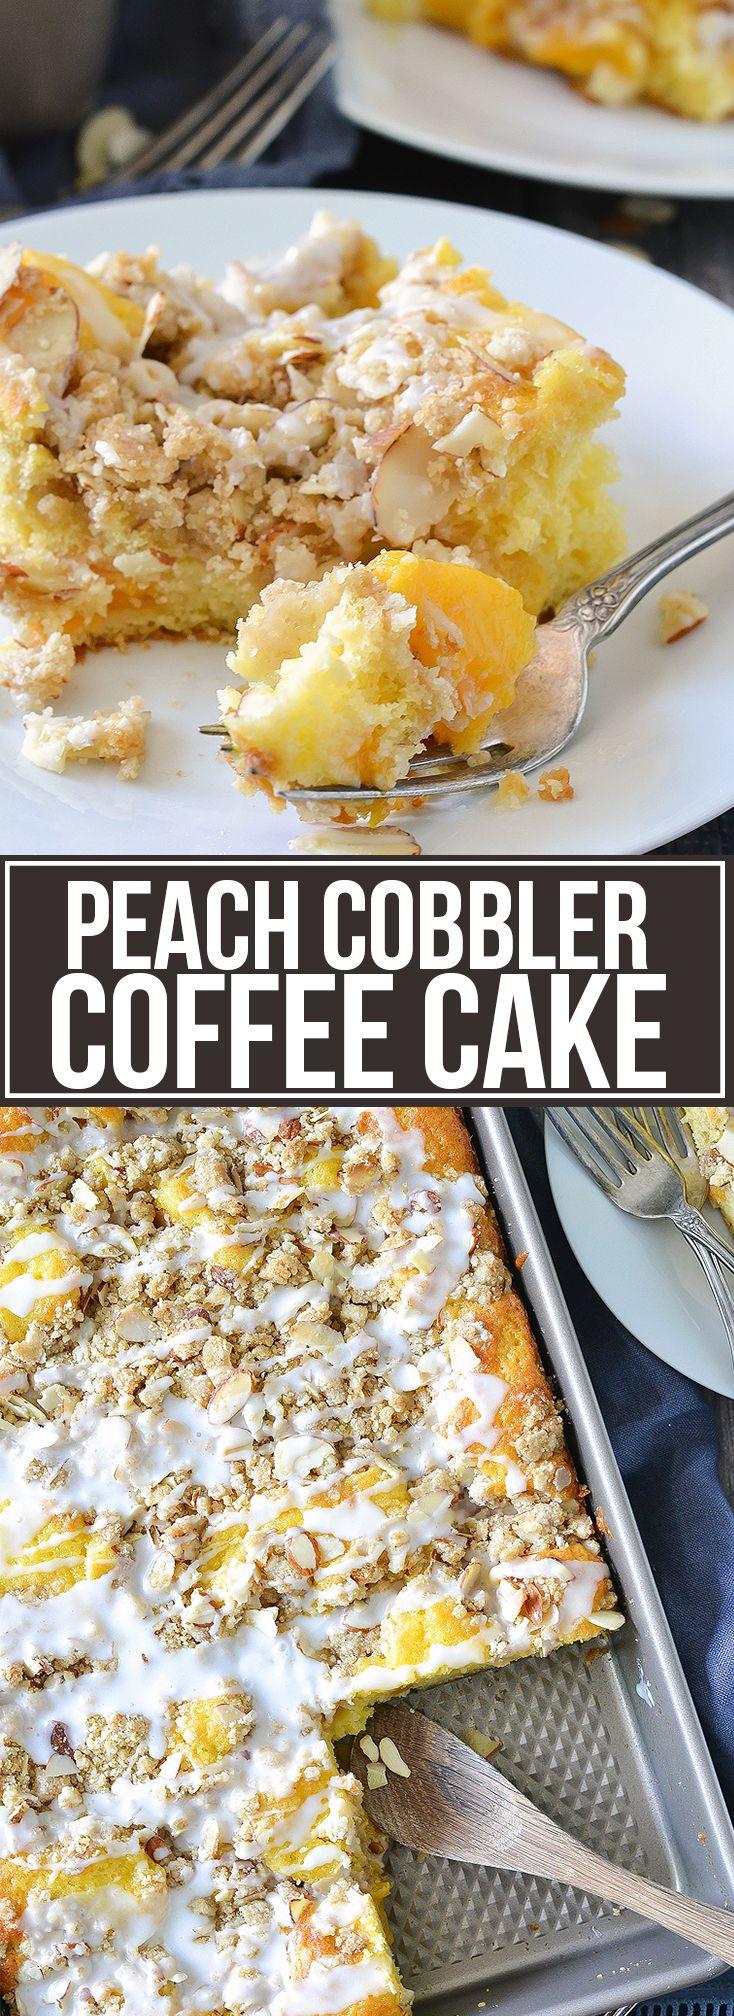 Peach Cobbler Coffee Cake #peachcobblerpoundcake